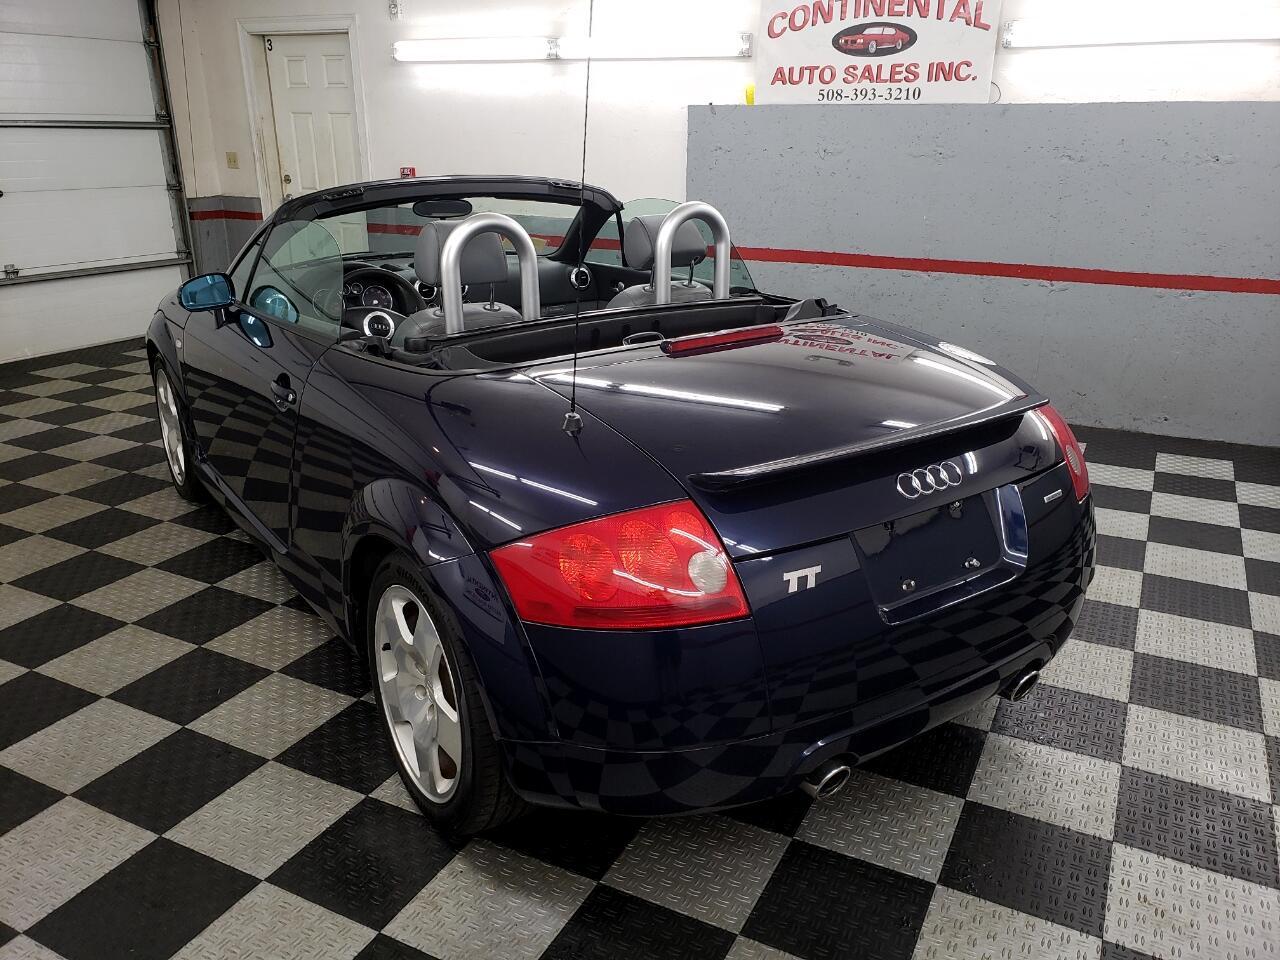 2002 Audi TT 2dr Roadster quattro 6-Spd